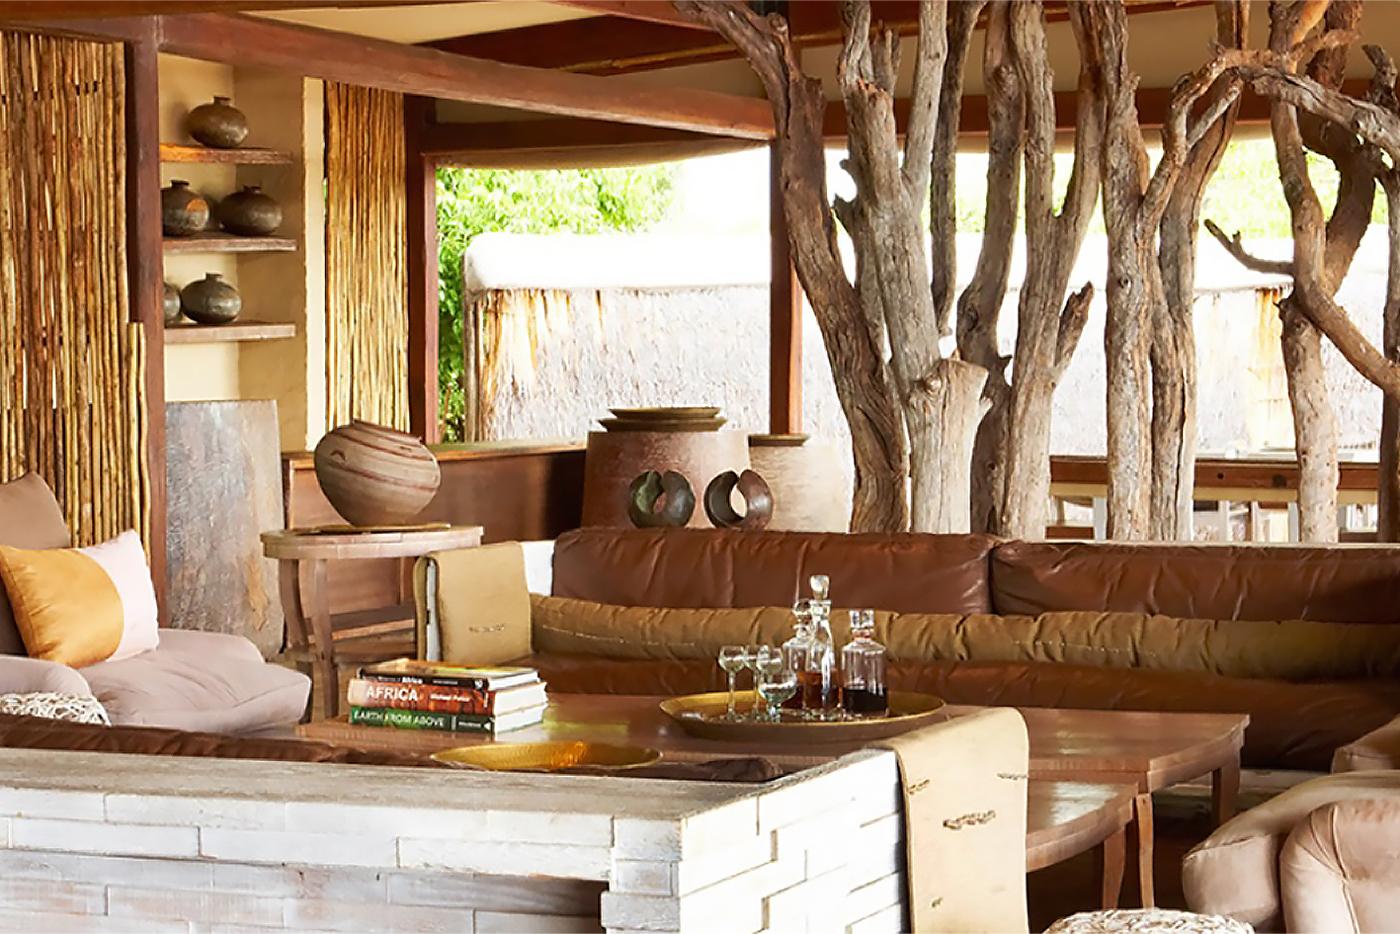 D_edit_Lounge-area-at-Kings-Pool-Camp_Botswana.jpg